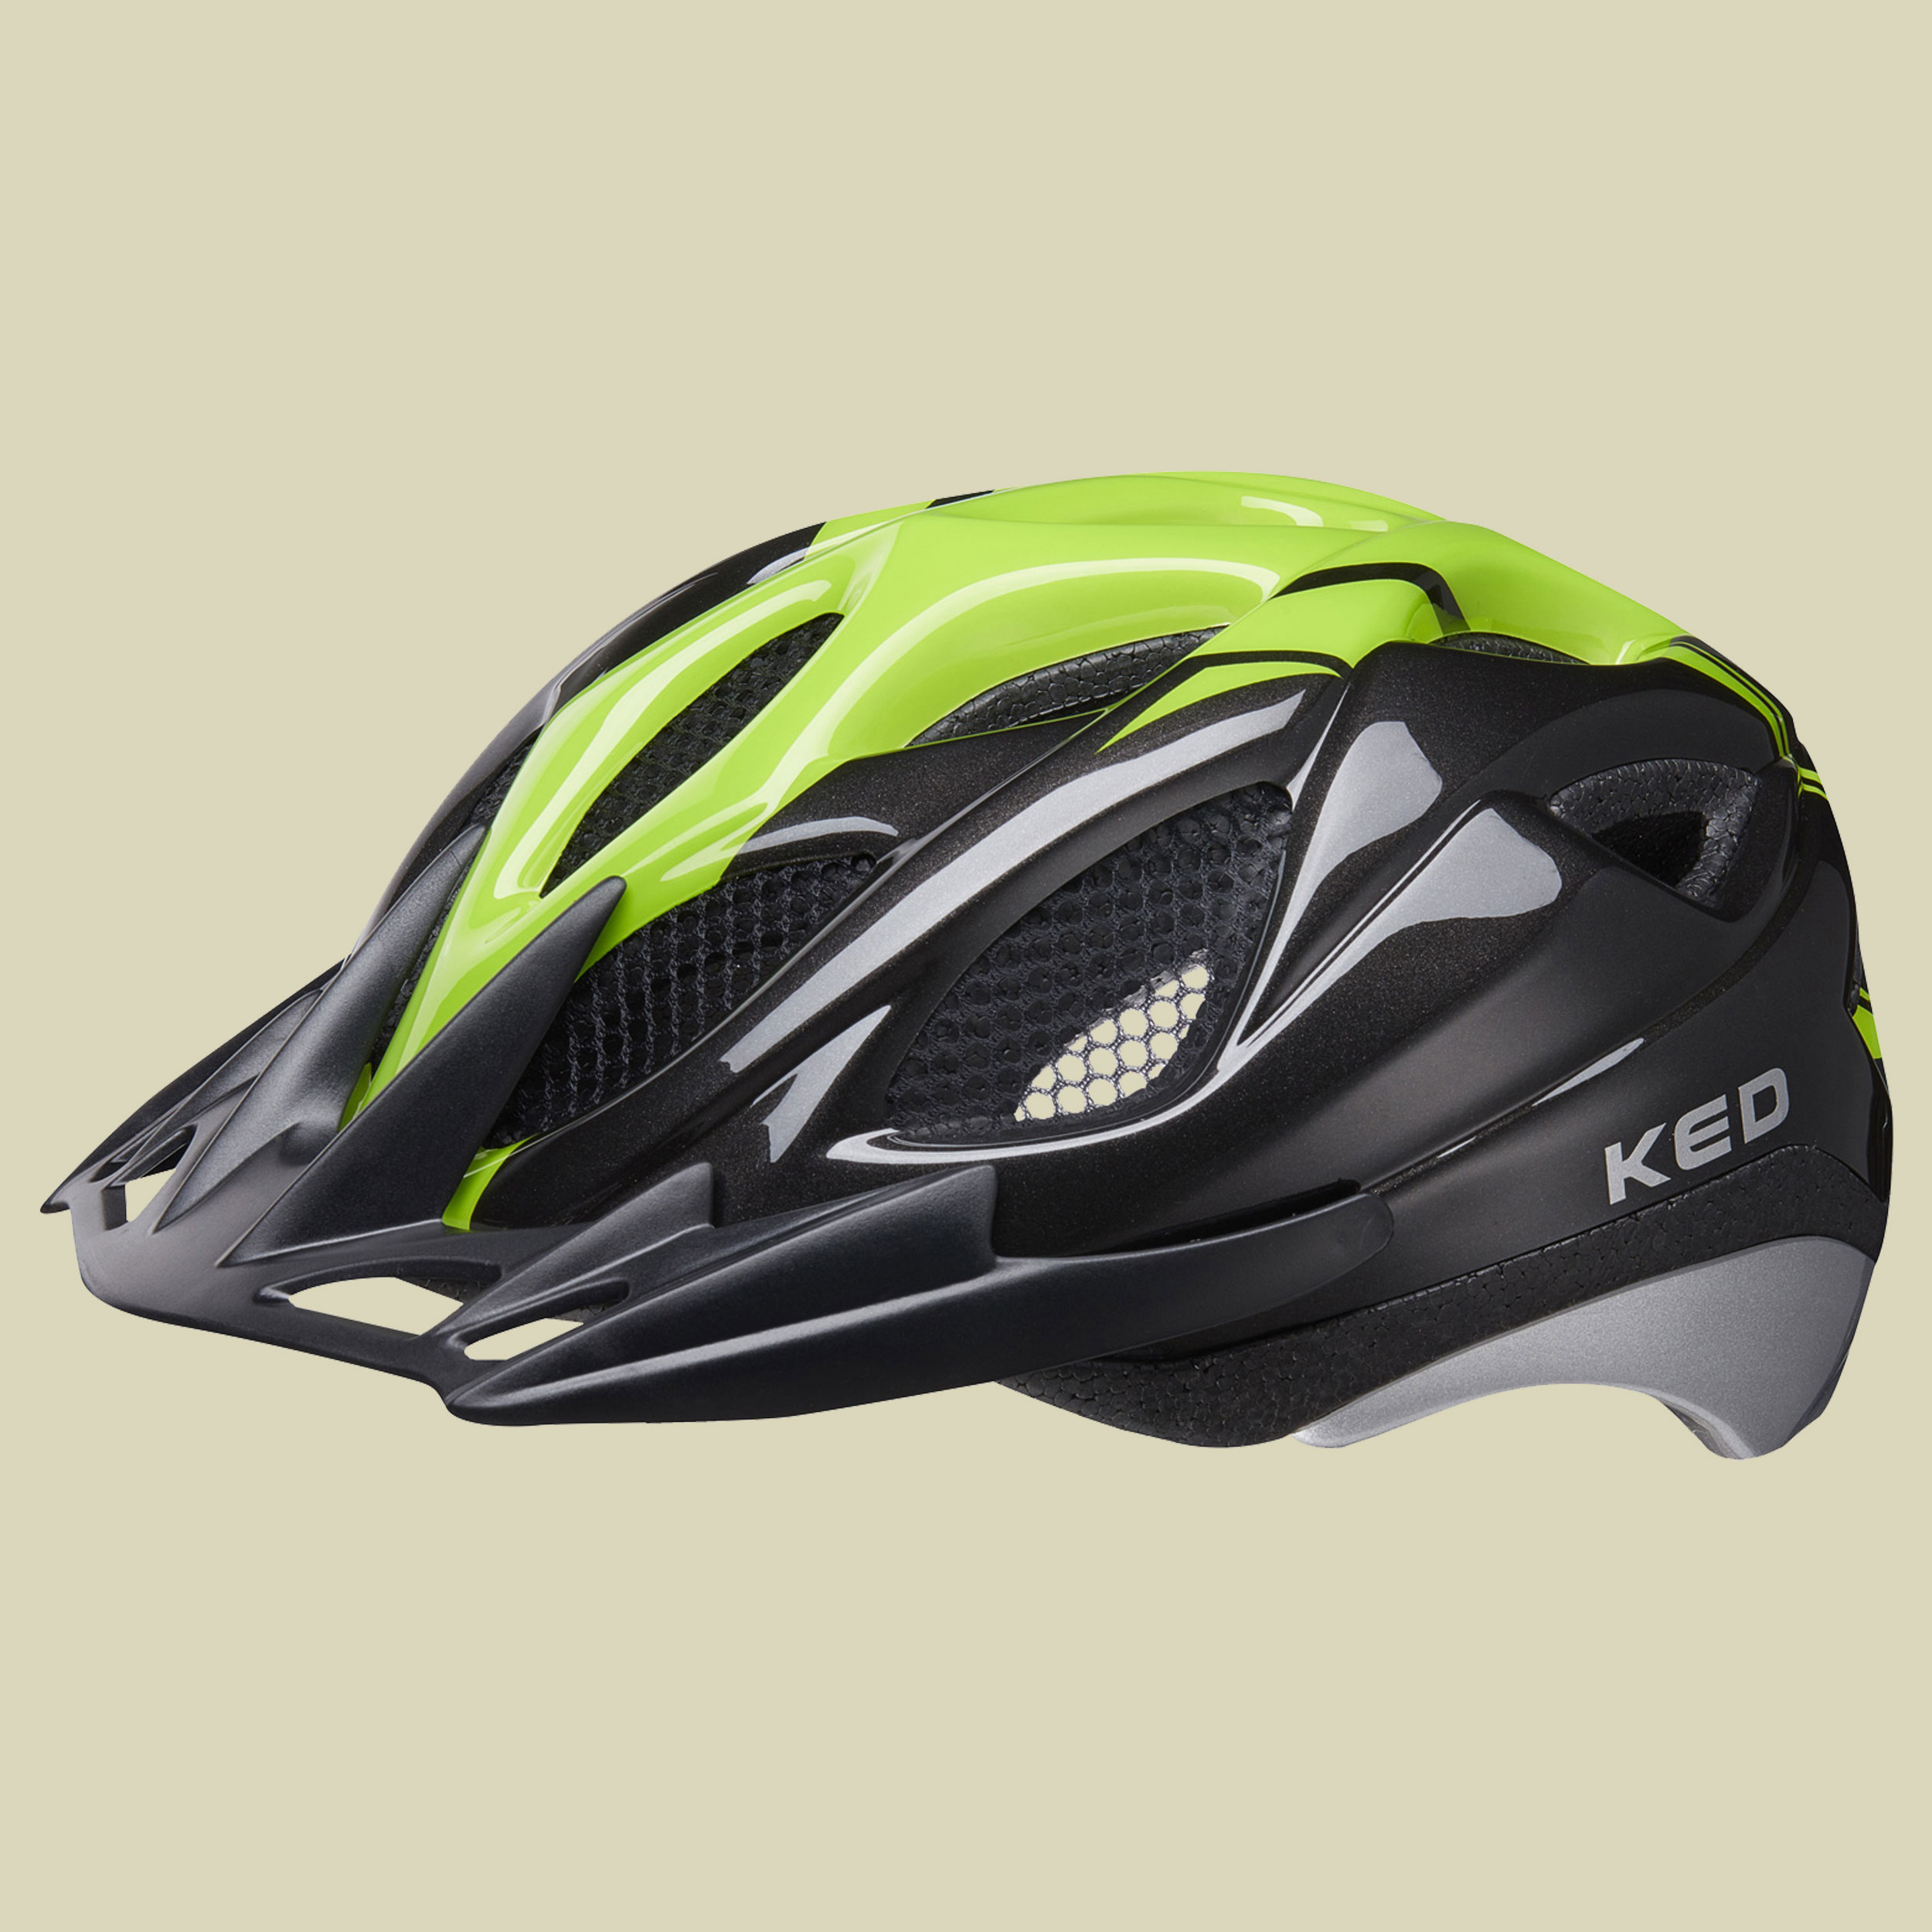 KED, Tronus, Kopfumfang M 52-56, Unisex Fahrradhelm, black green